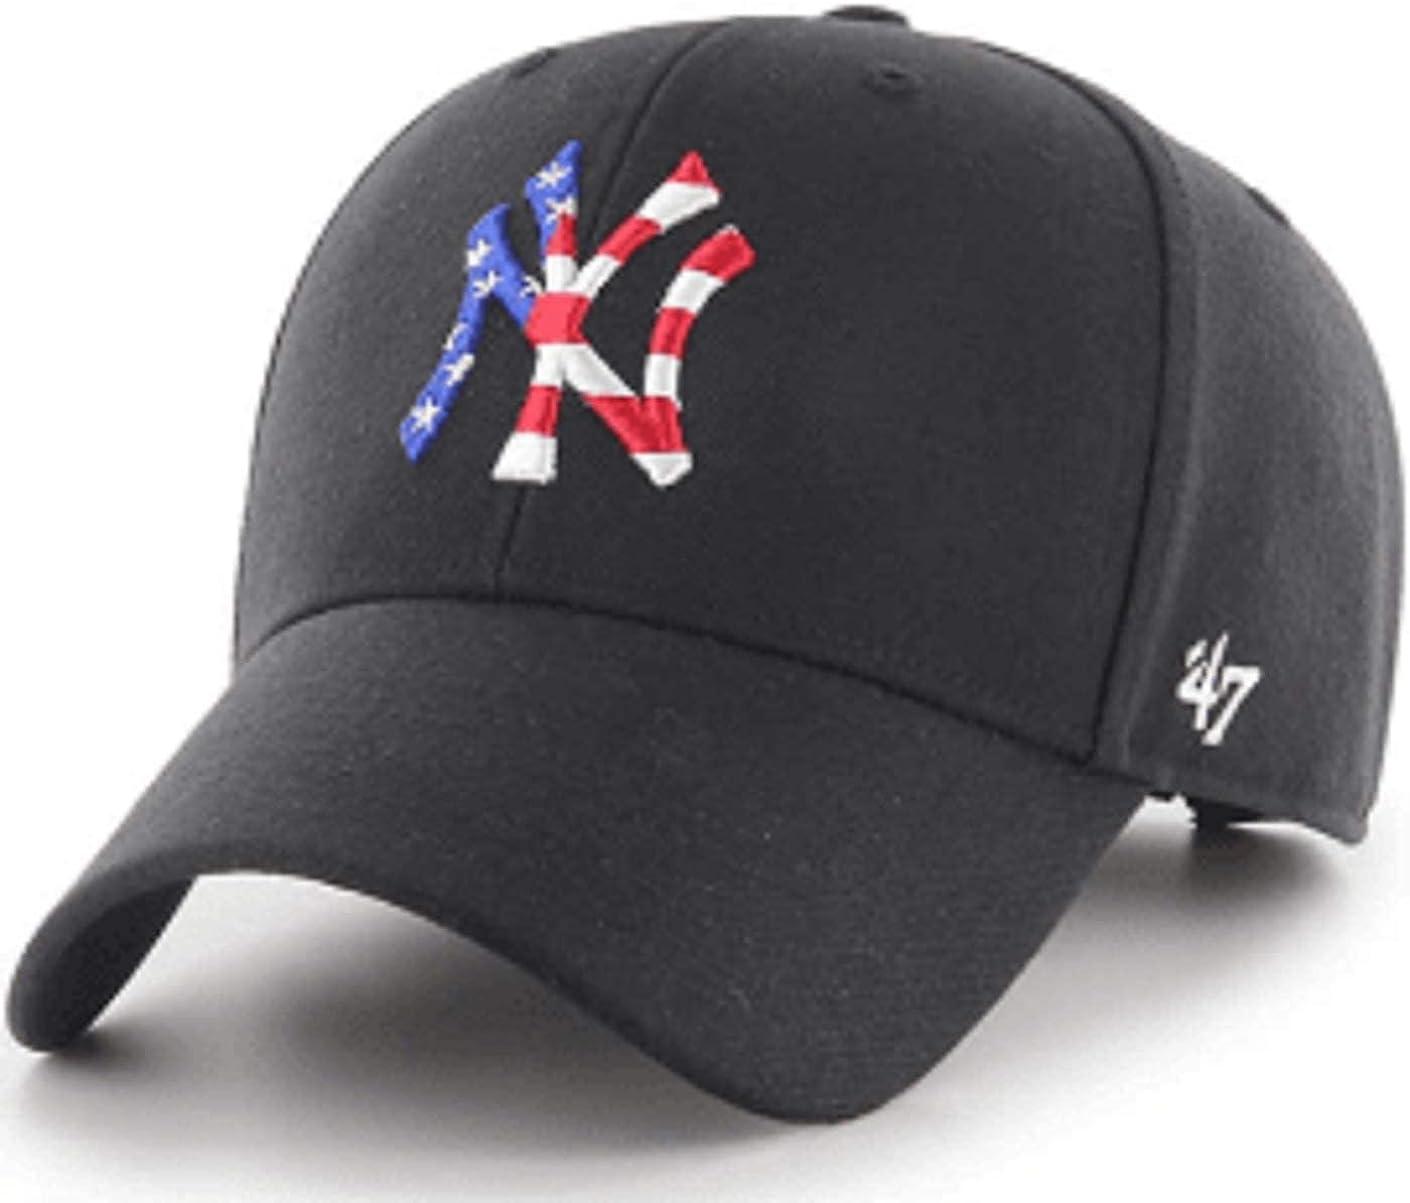 New Era 最安値 York Yankees 直営ストア Exclusive Snapback 9FIFTY Selection Adj